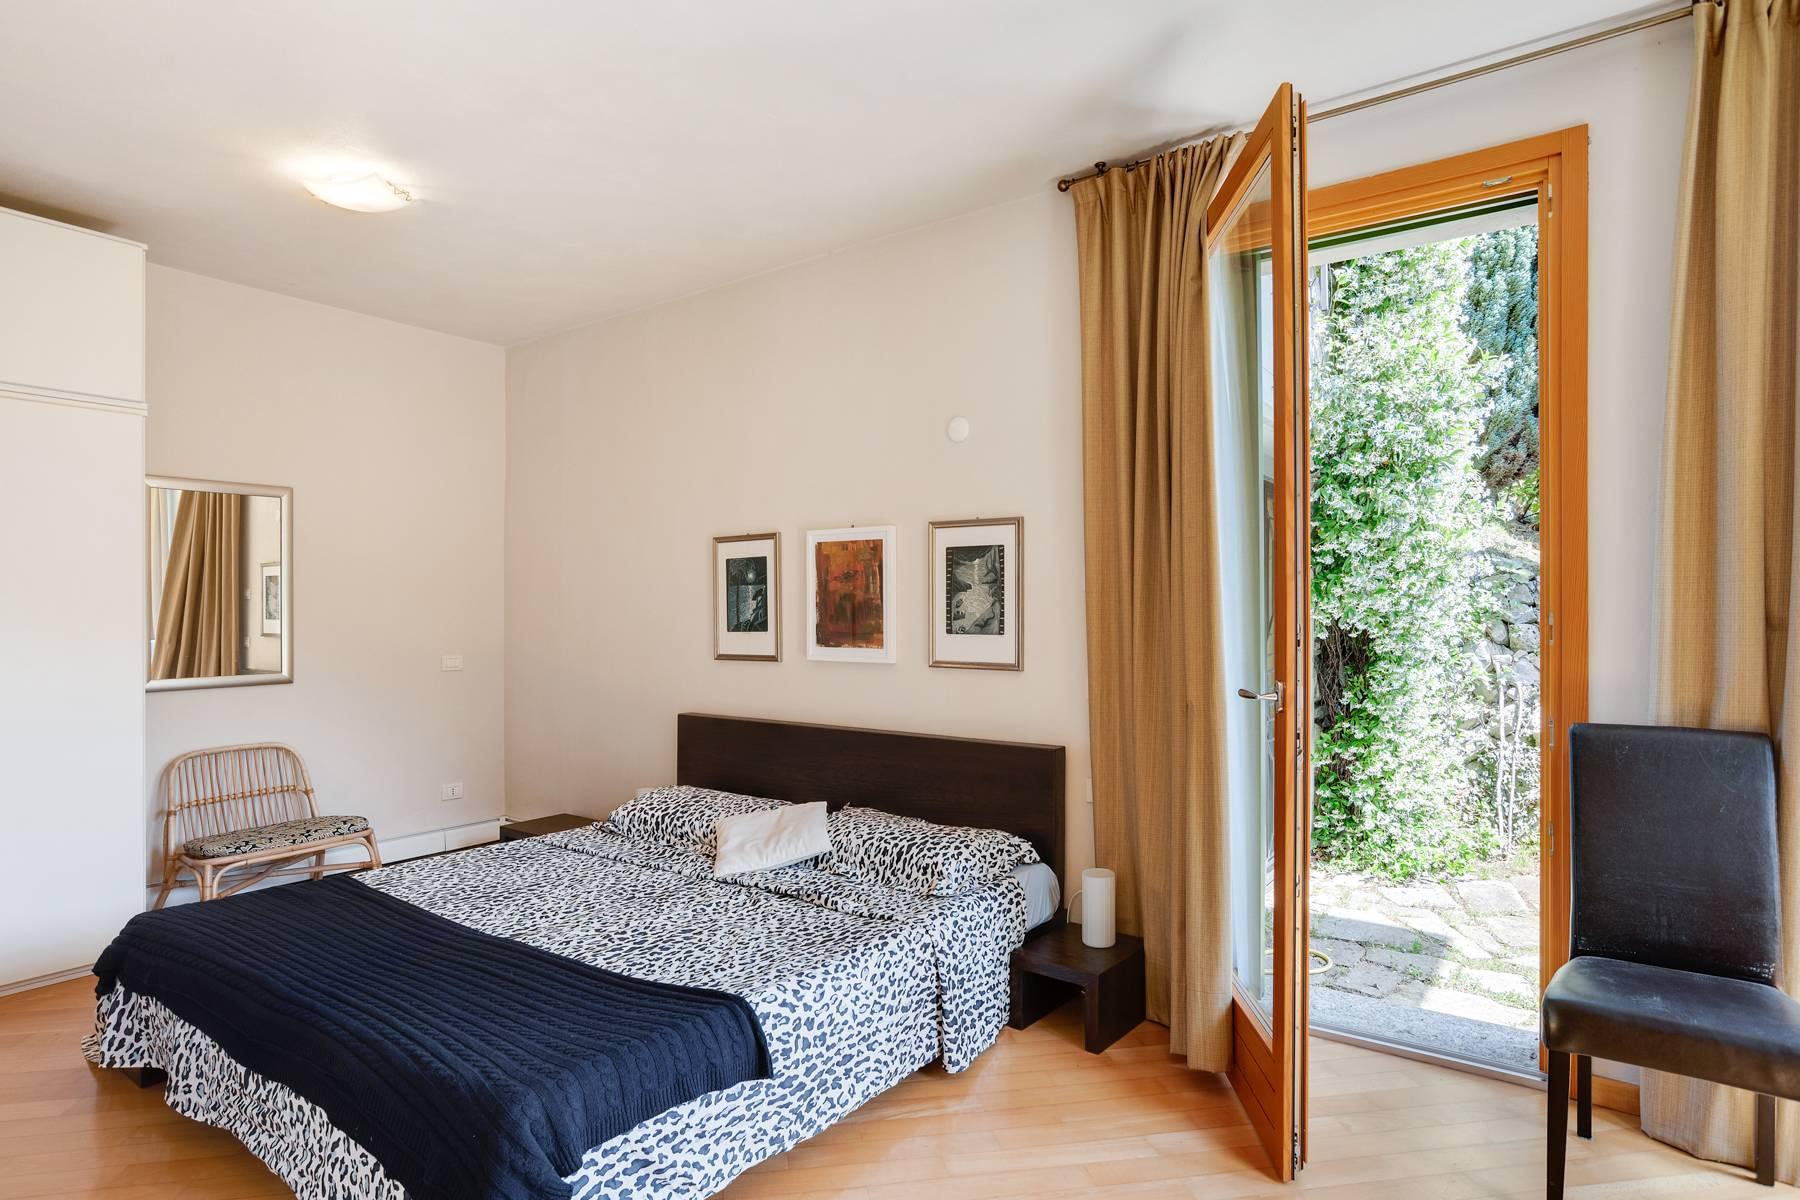 Splendida villa moderna sulla collina soleggiata sopra Argegno - 38